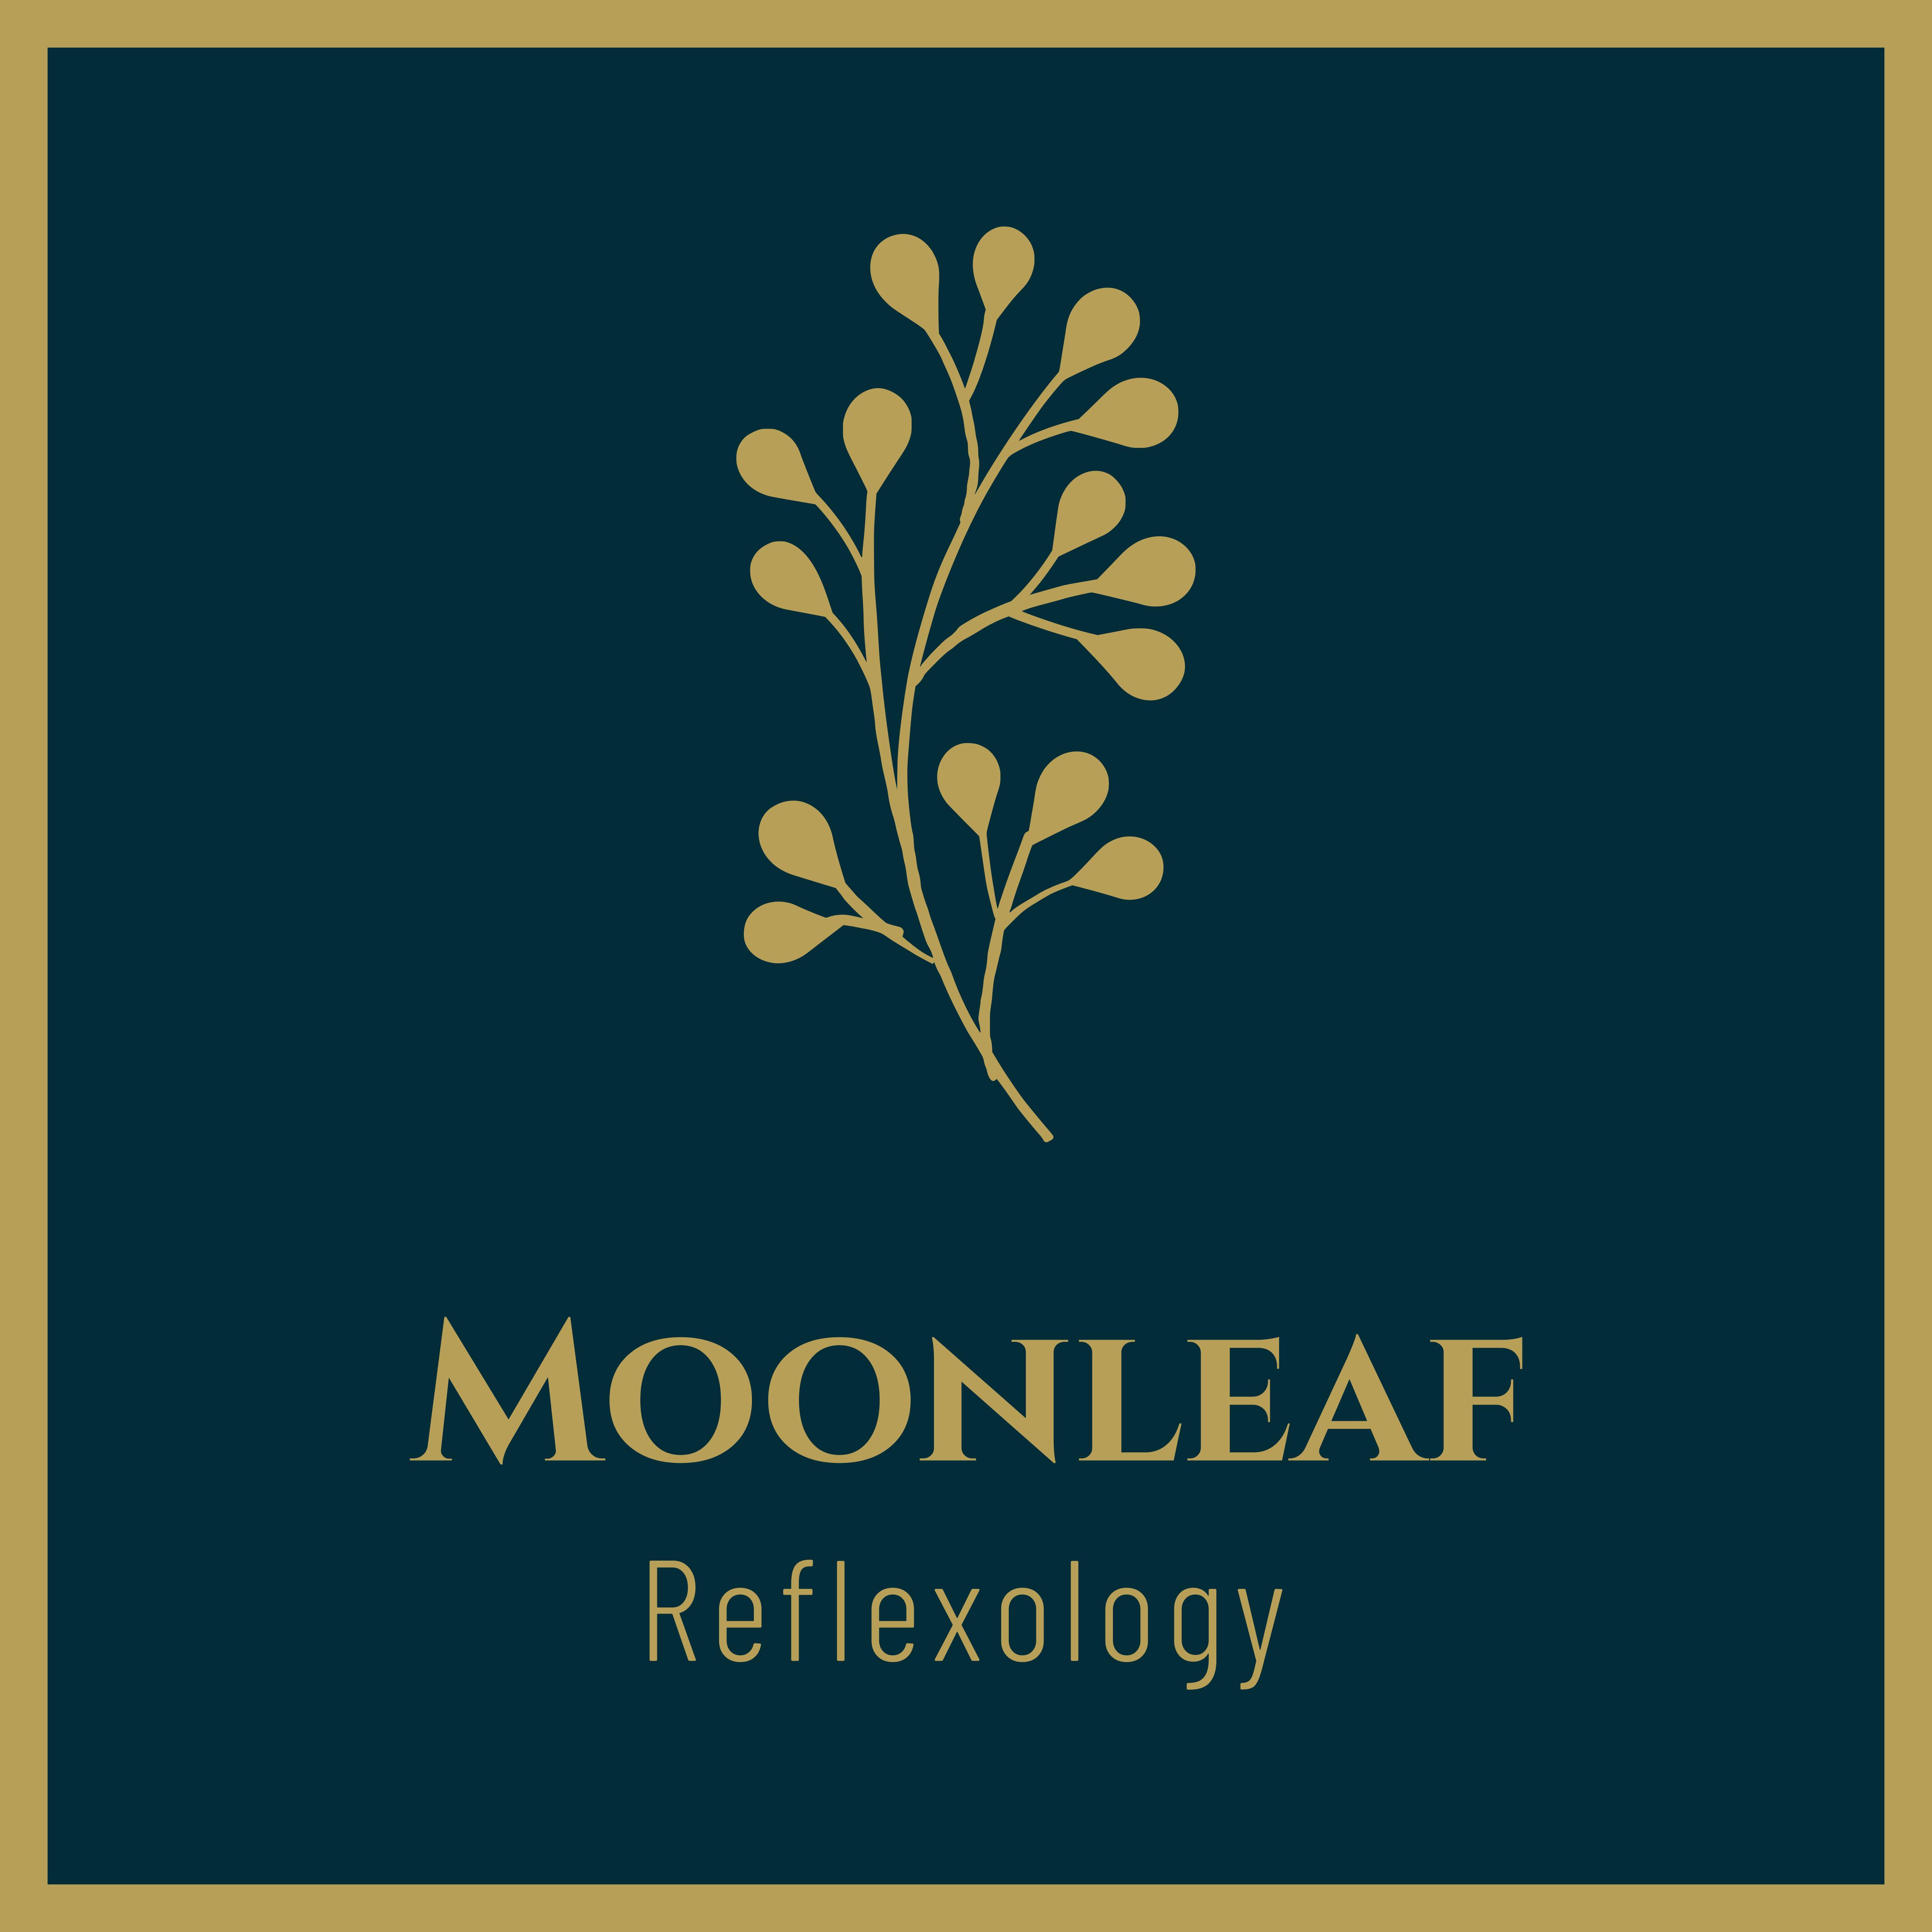 Reflexology Chrishall Moonleaf Reflexology Testimonials